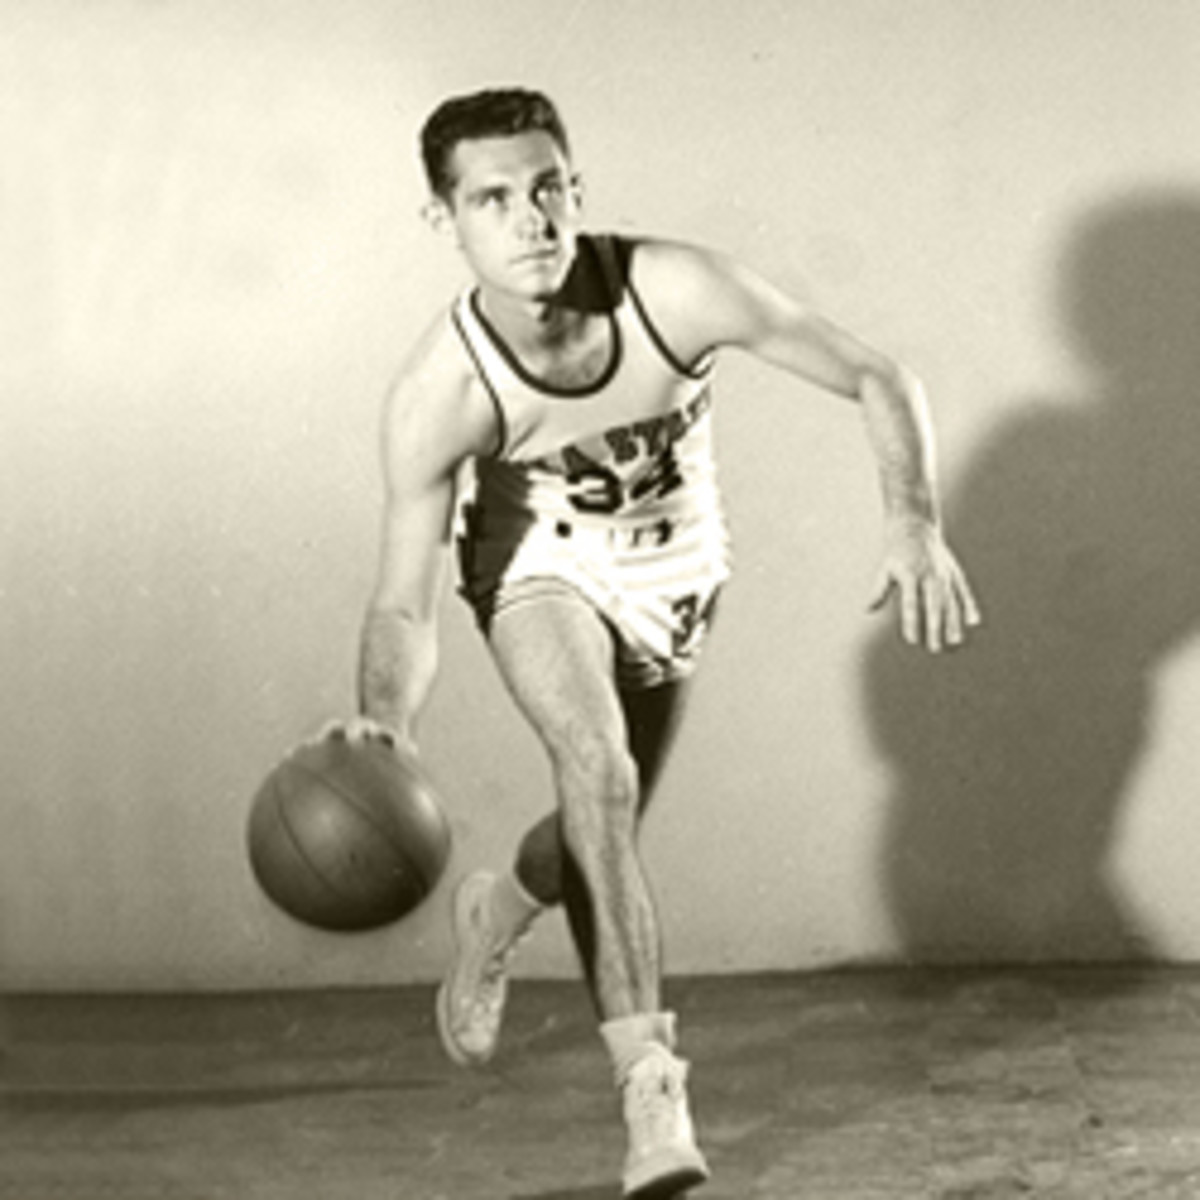 Eddie Sutton's senior season was special with an NCAA Tournament bid.